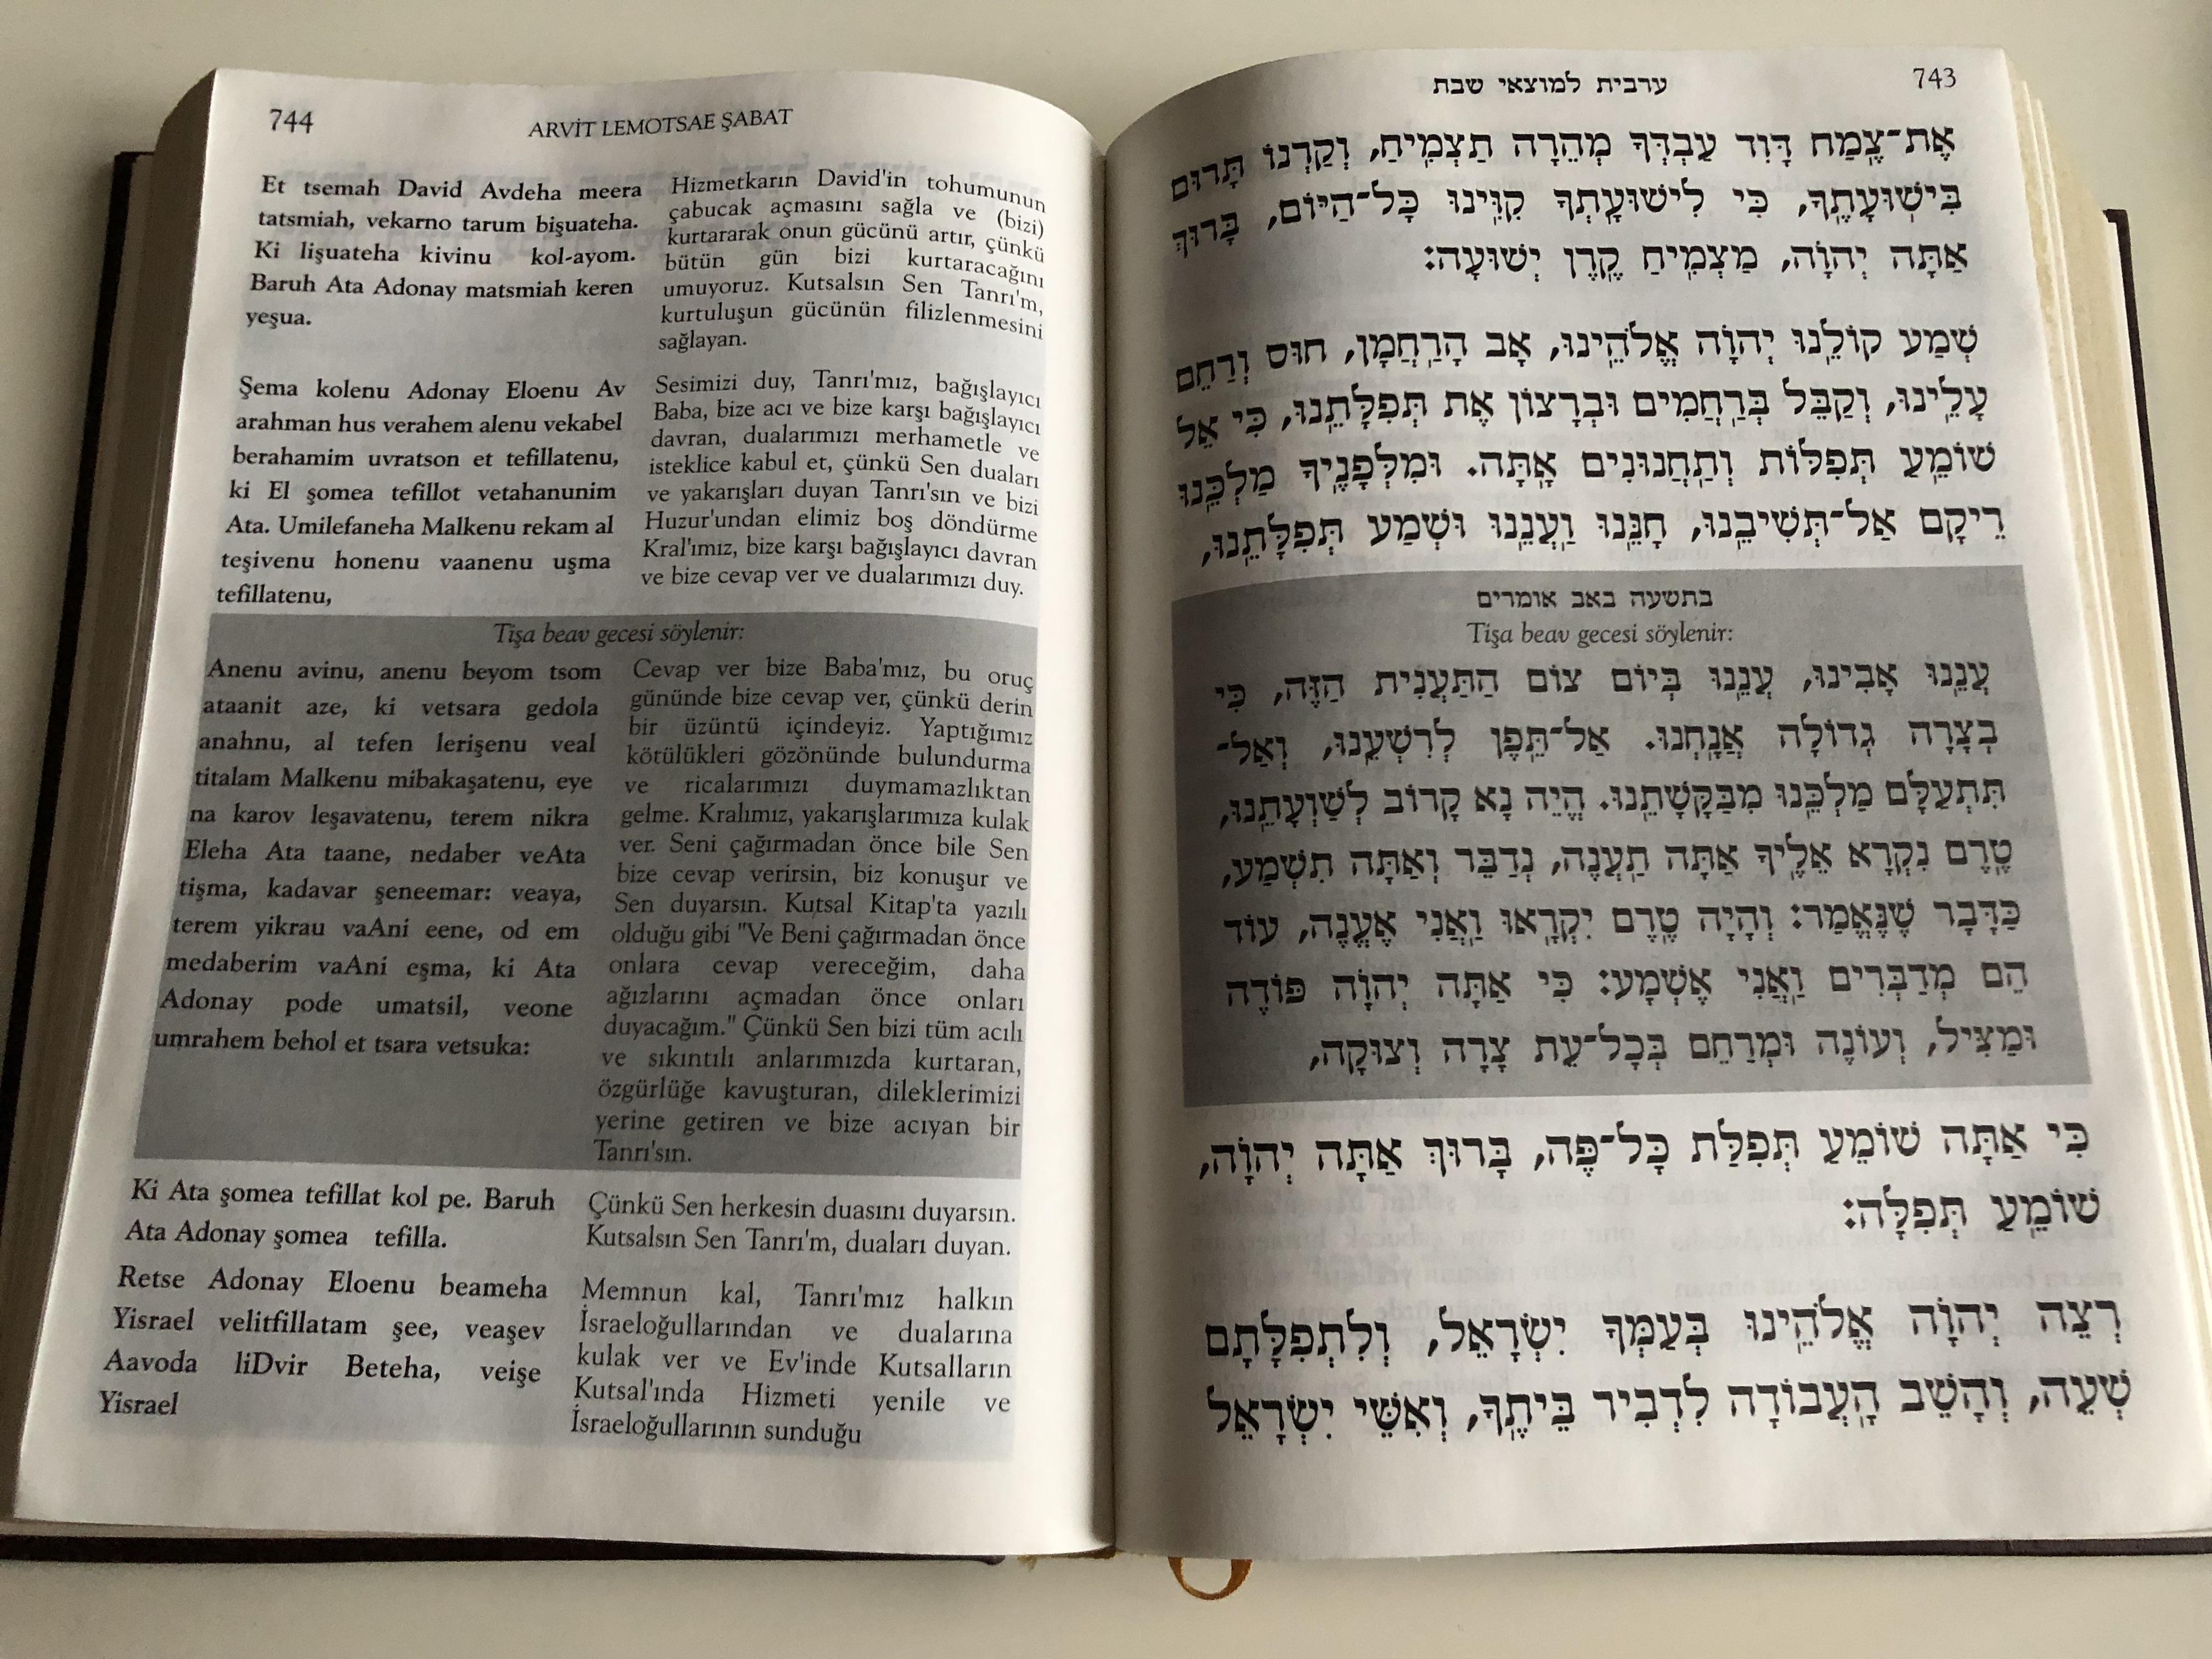 sidur-kol-yaakov-hebrew-turkish-bilingual-prayer-book-lilane-zerbib-kazes-golden-edges-hardcover-2013-19-.jpg